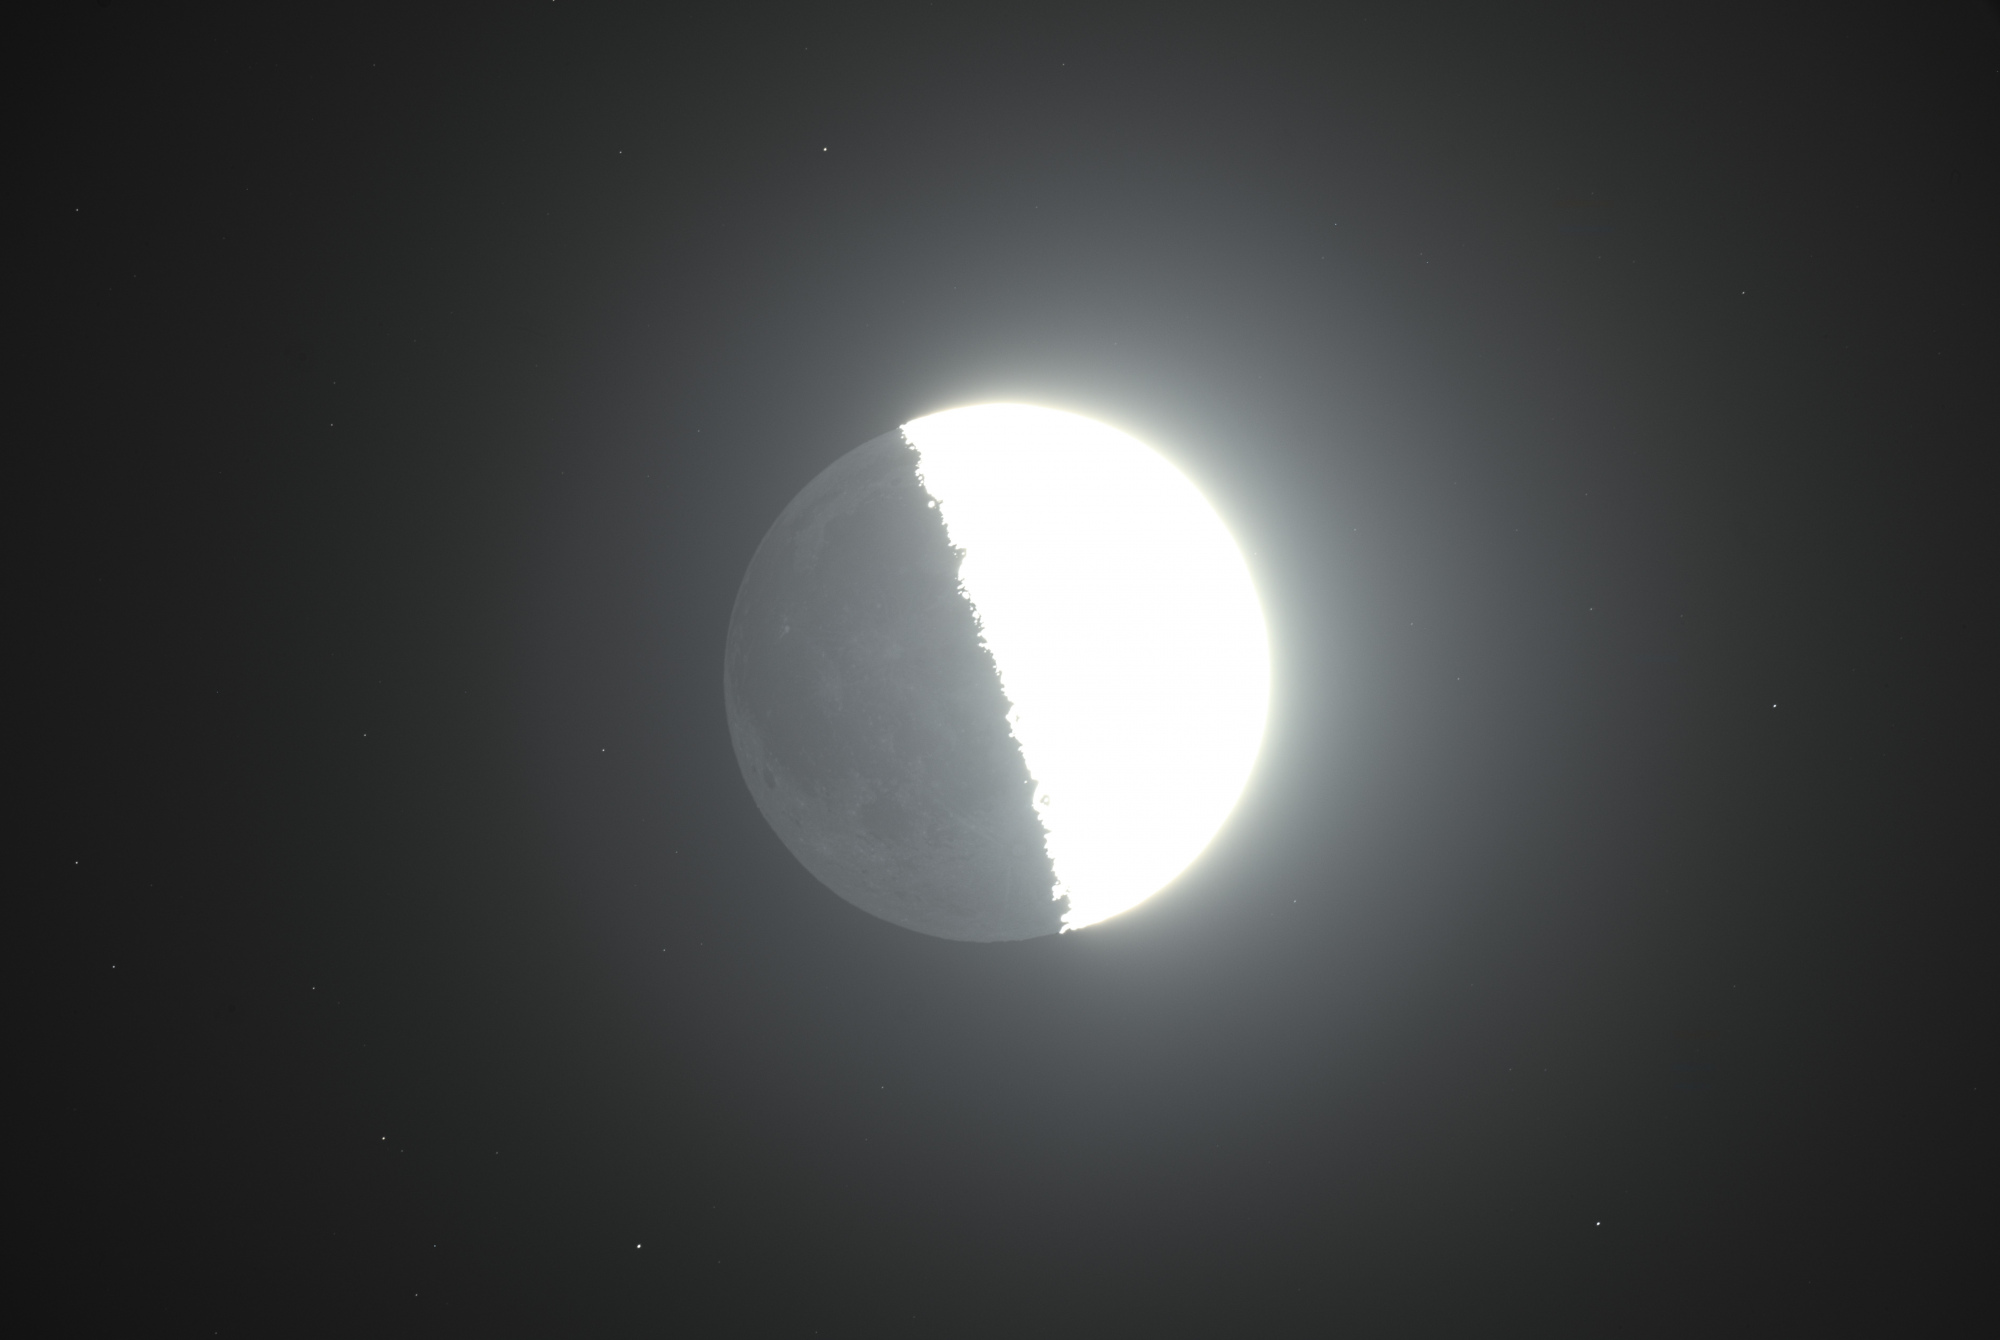 earthshine.thumb.jpg.48f5e785bfb3085ca715612909aacfdc.jpg